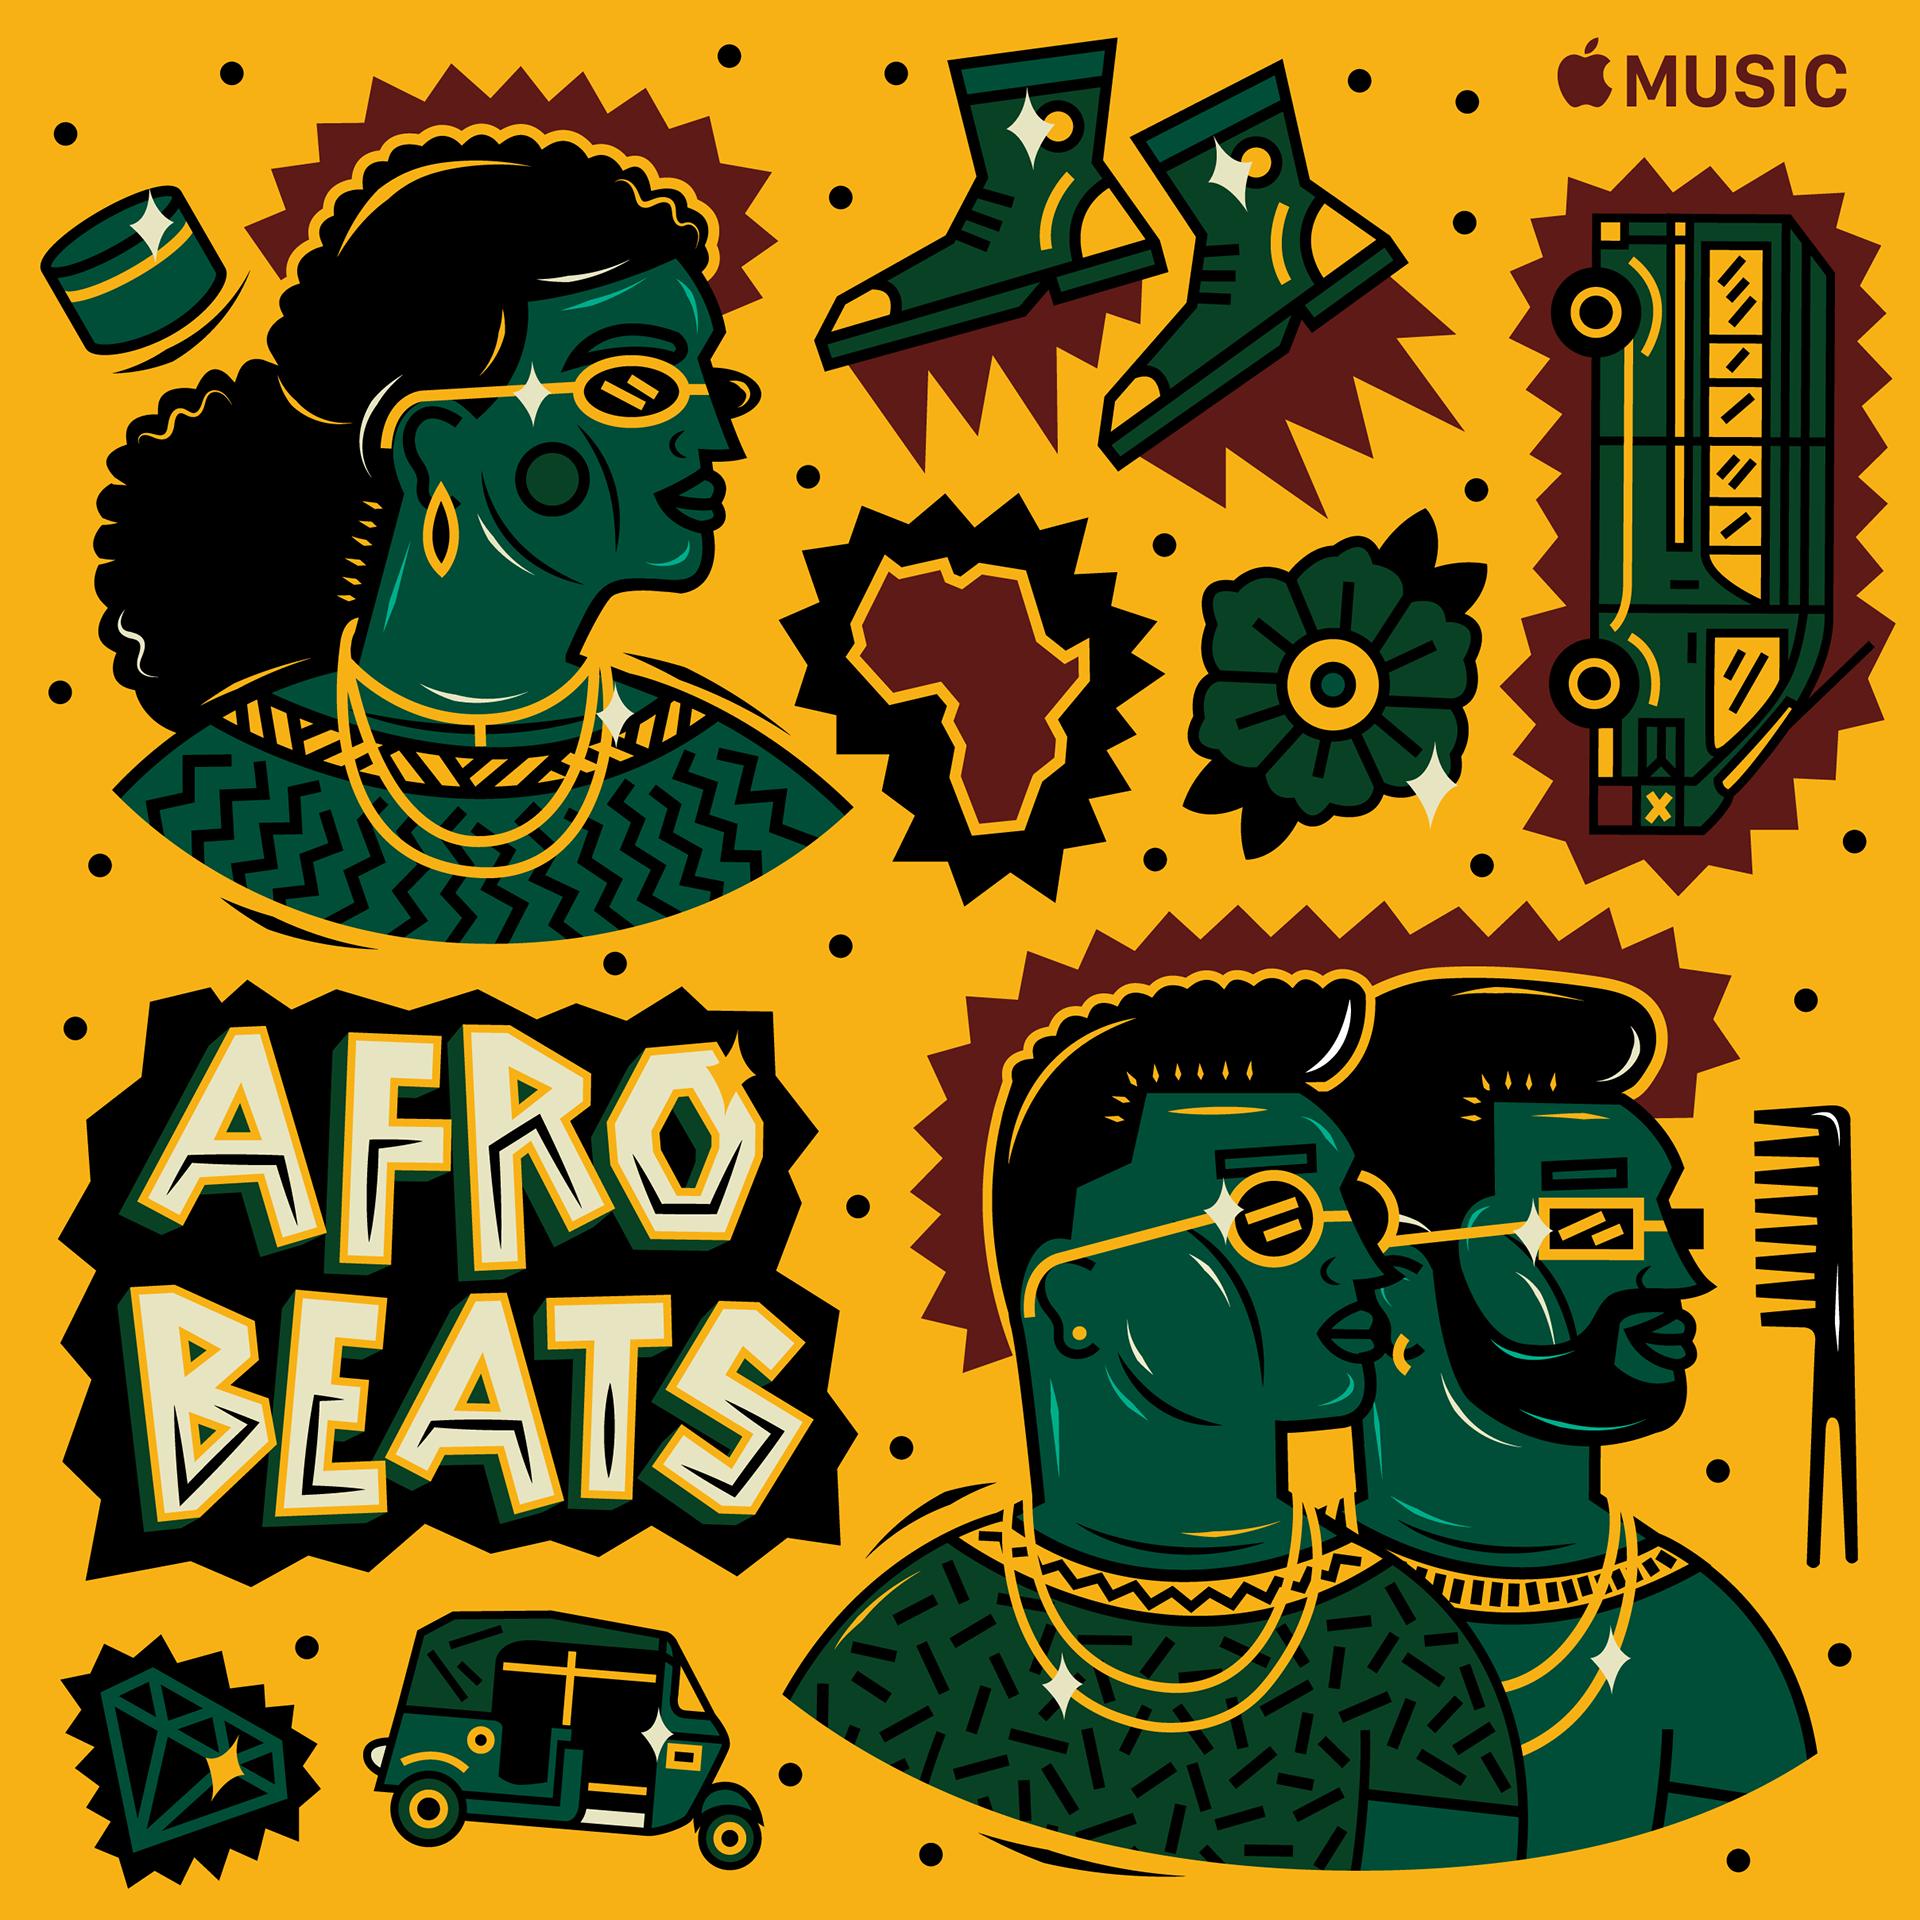 Apple Music Afrobeats Hits Playlist Cover Art on Behance